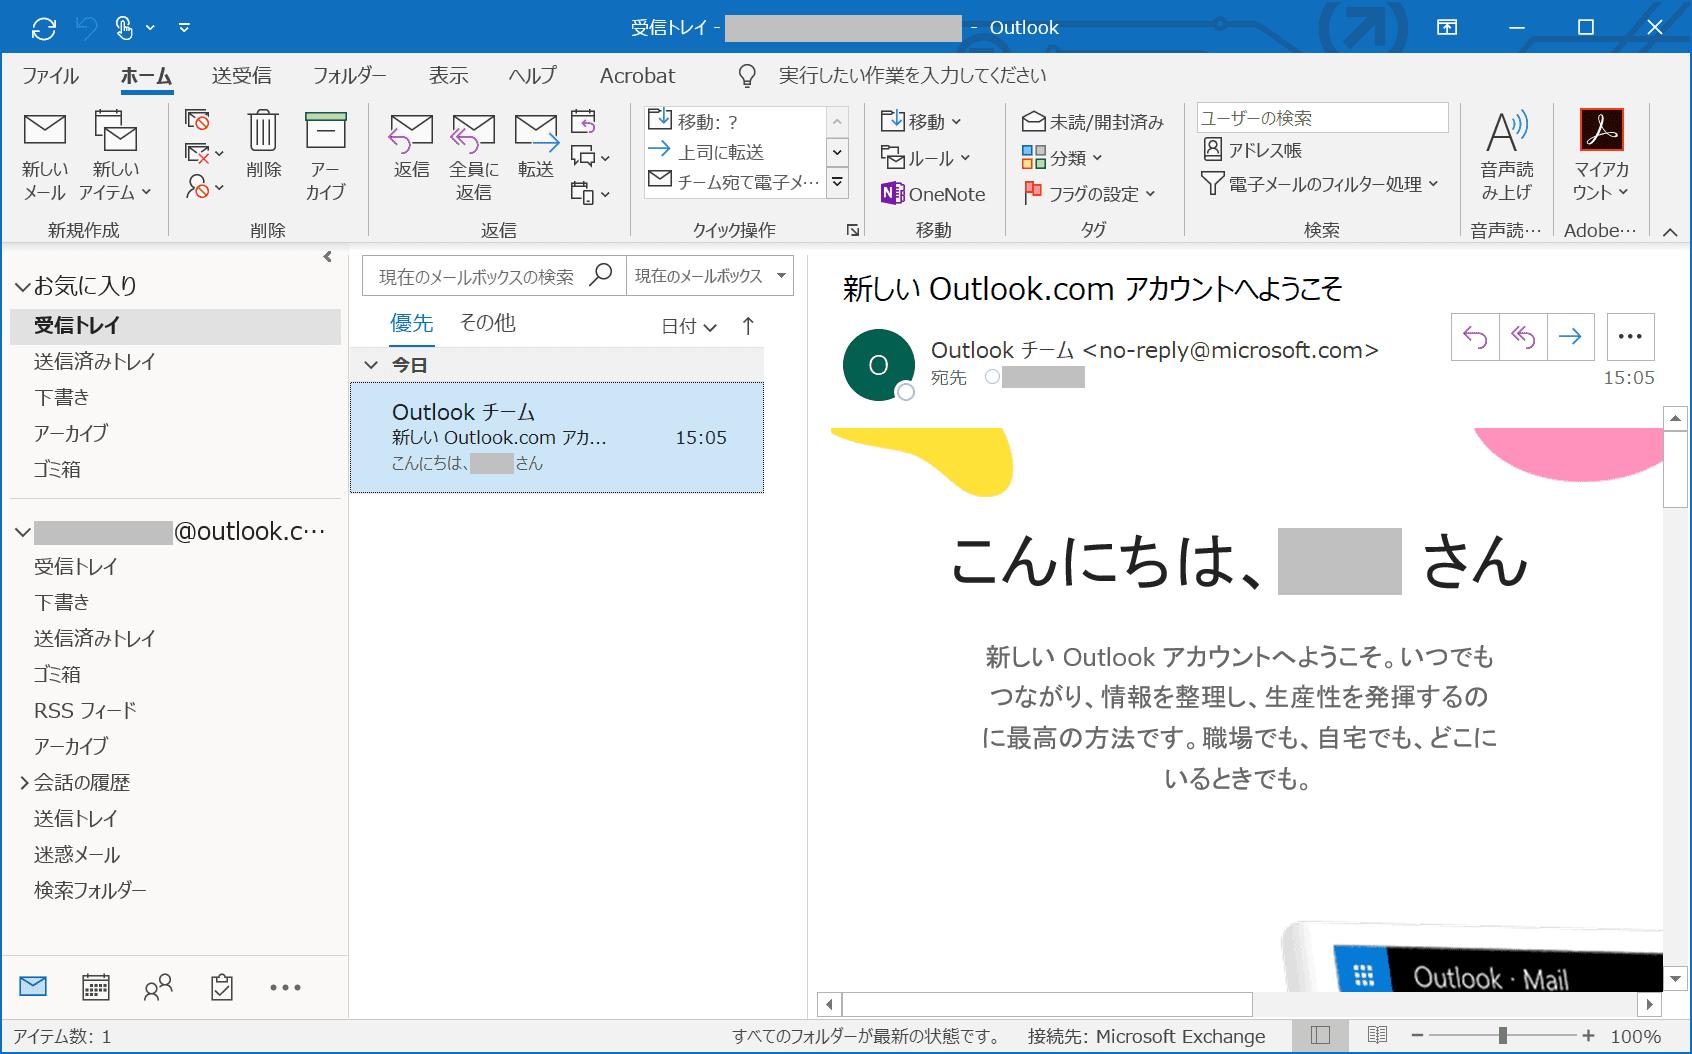 Outlook 2019の起動